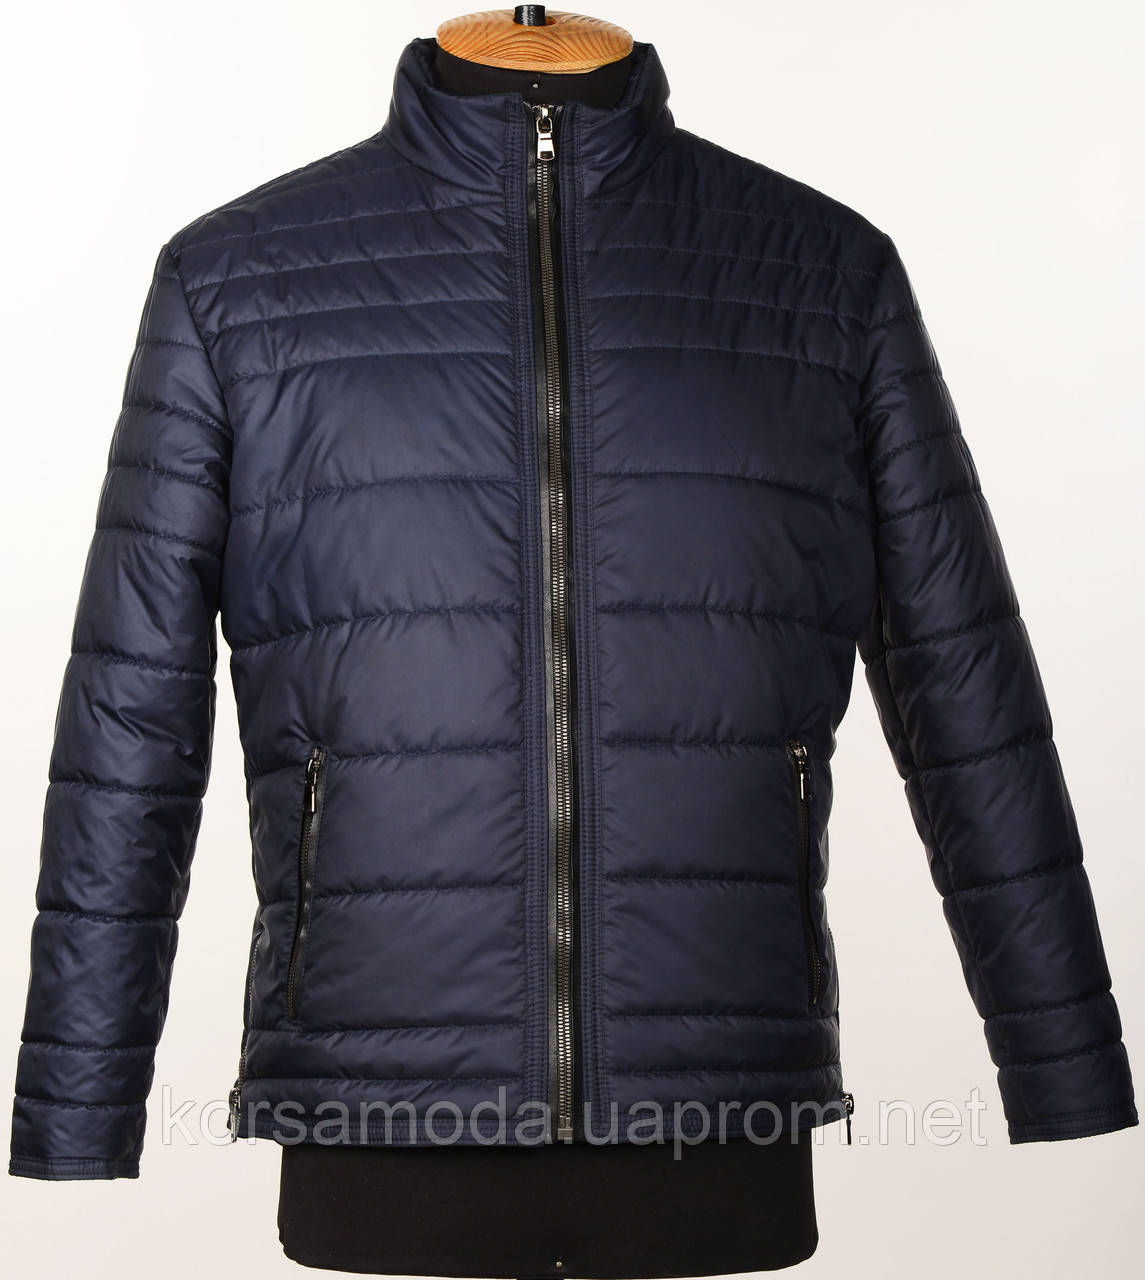 e4bae11f Мужская,демисезонная,стеганная куртка темно-синего цвета.Новинка!!! -